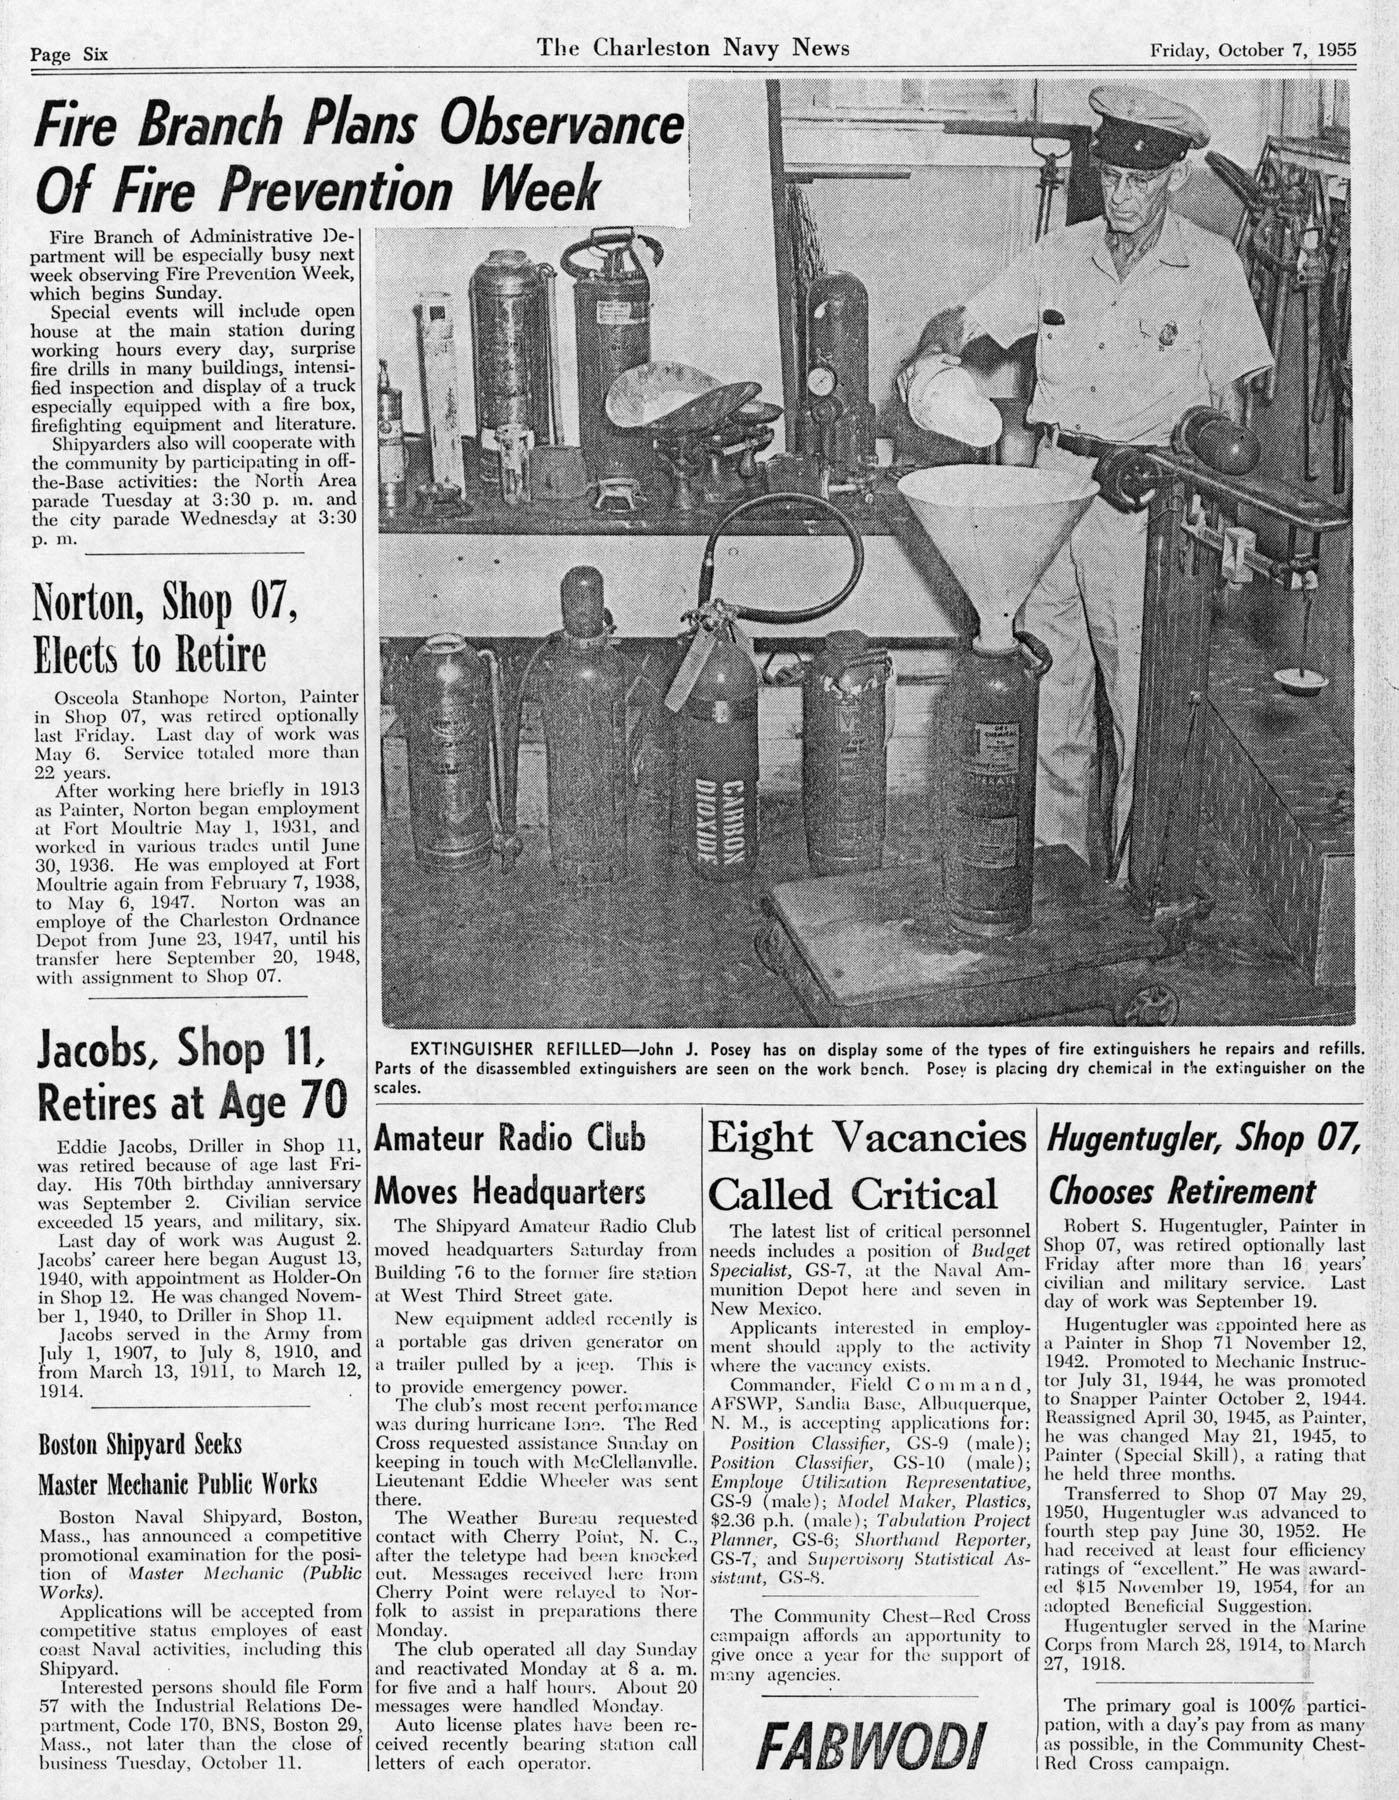 The Charleston Navy News, Volume 14, Edition 6, page vi